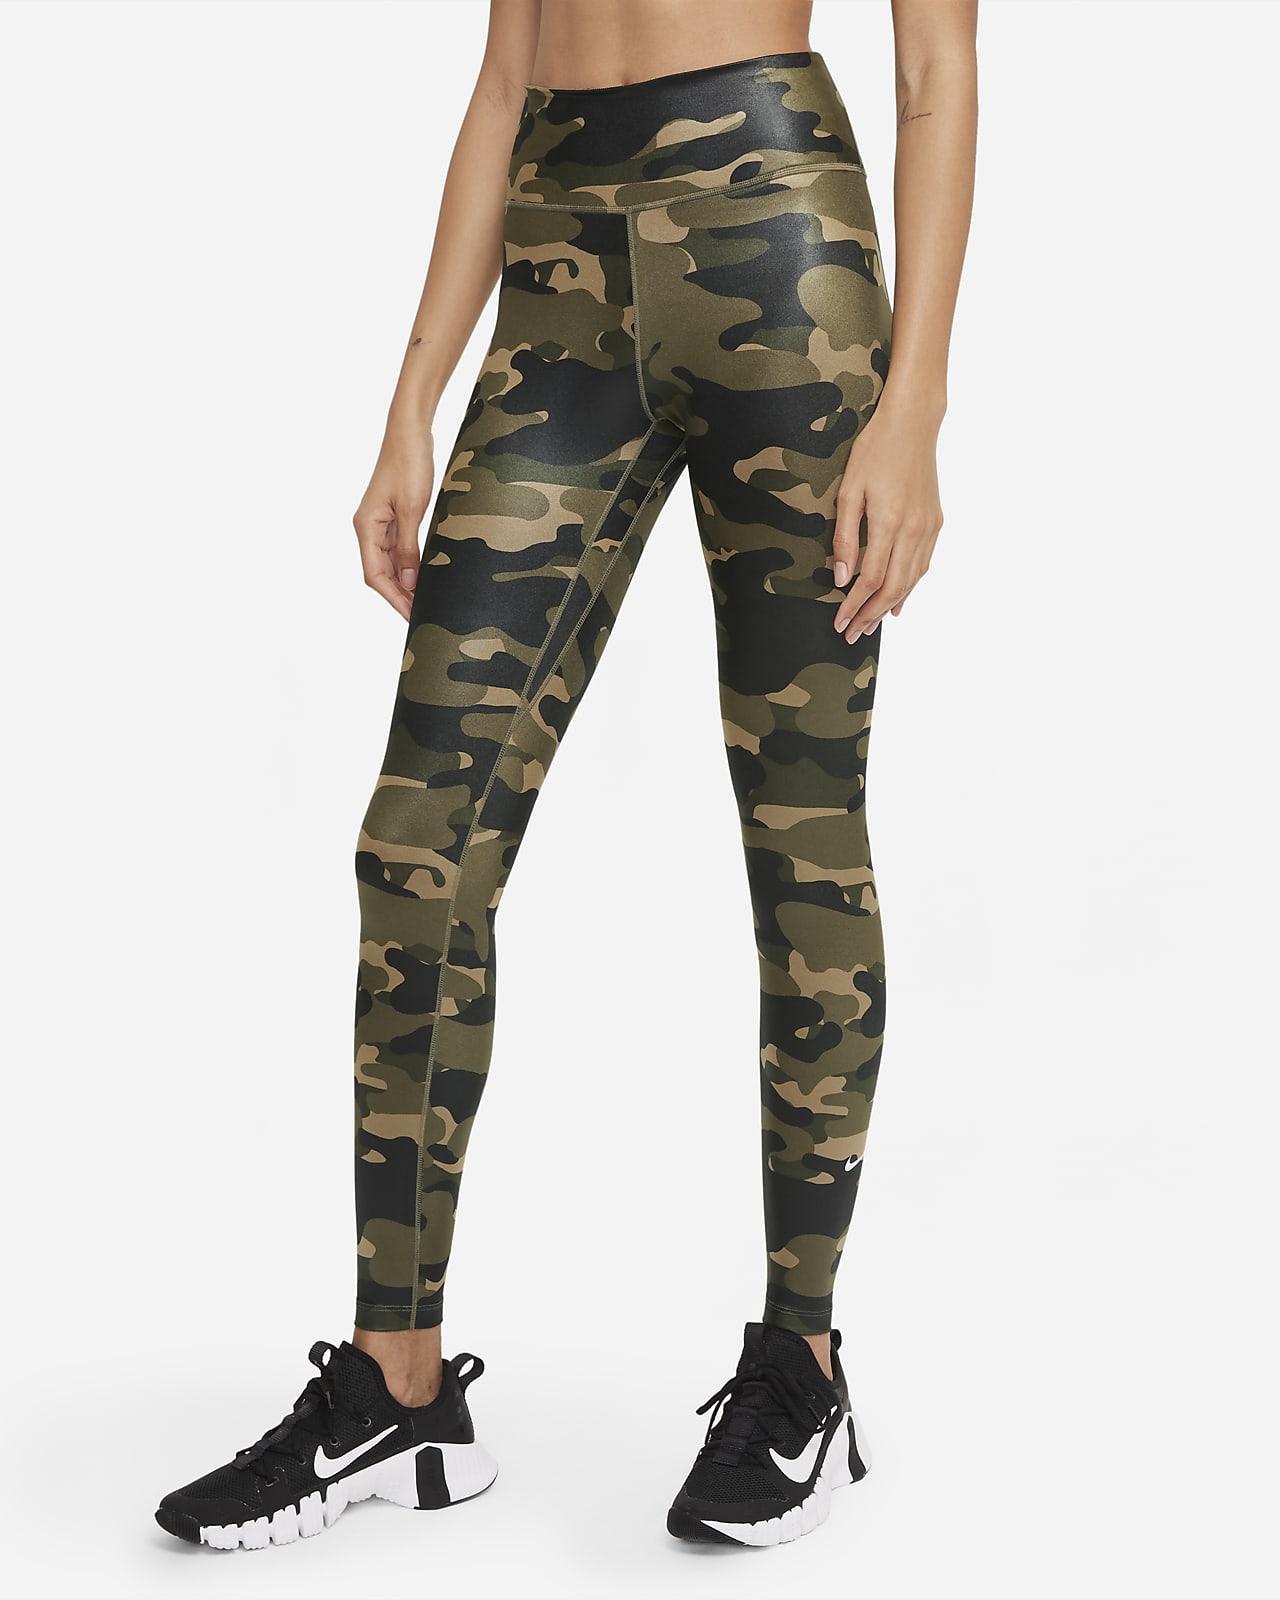 Nike Dri-FIT One Women's Mid-Rise Camo Leggings